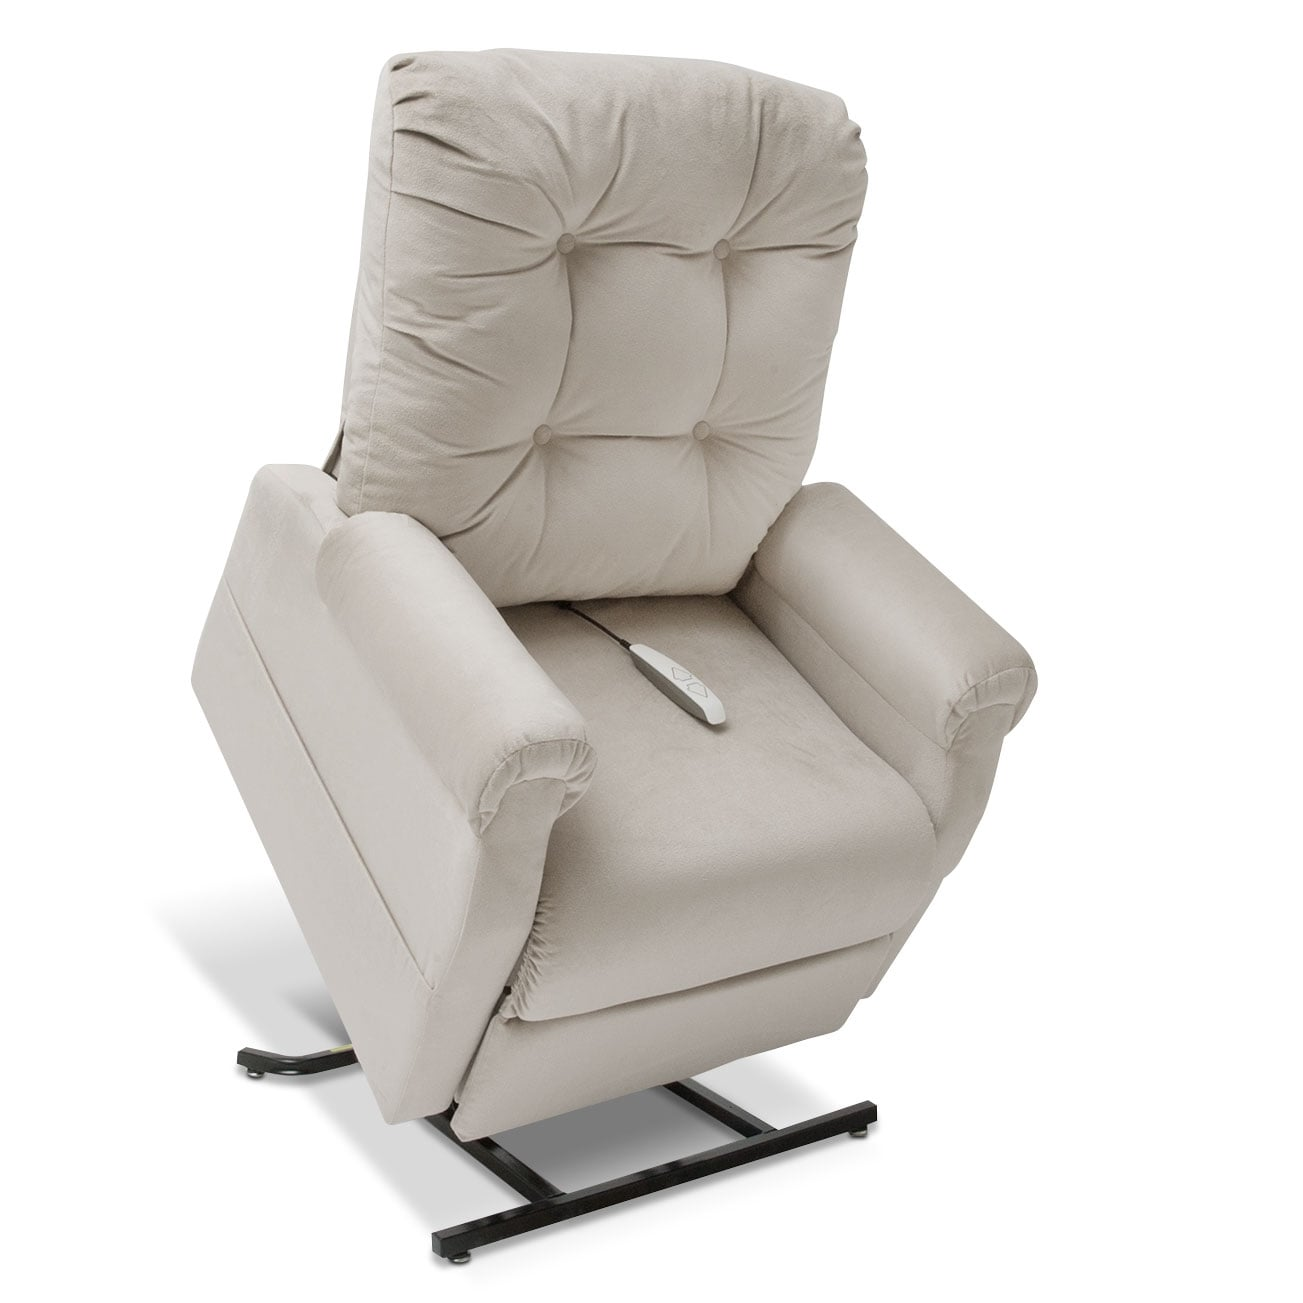 Living Room Furniture - Elmer Lift Chair - Linen